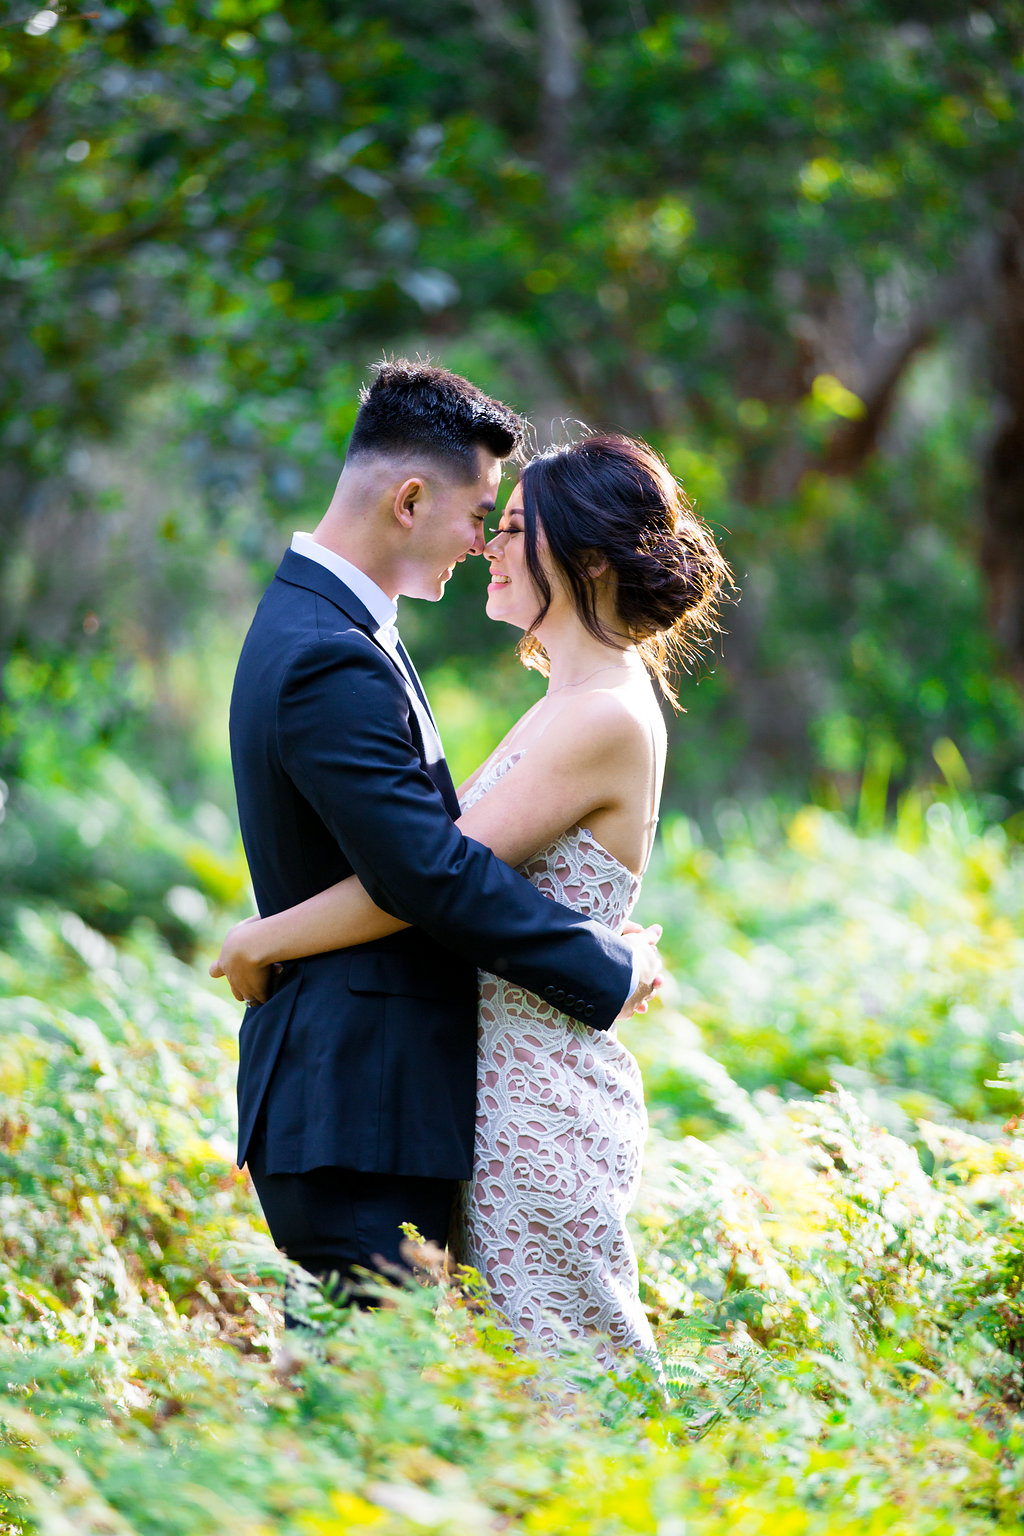 Sydney Professional Wedding Photographer - Asian Weddings - Jennifer Lam Photography - Centennial Parklands (10).jpg